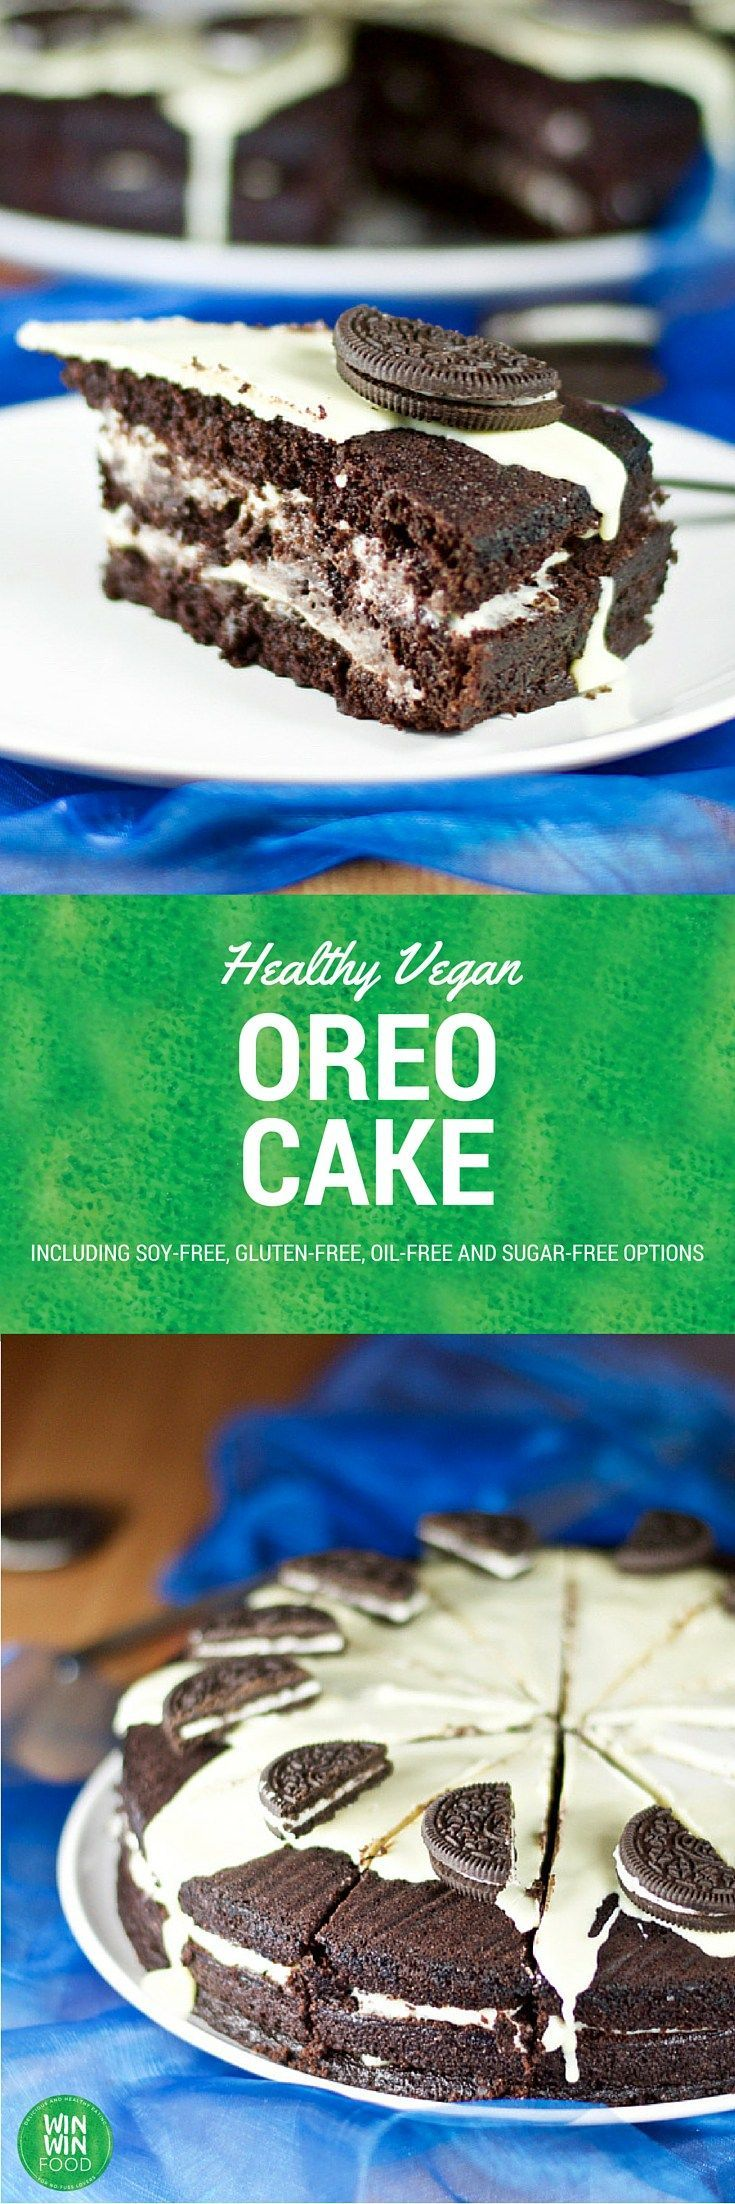 Healthy Vegan Oreo Cake | WIN-WINFOOD.com #healthy #vegan and optionally #glutenfree and #sugarfree dessert that's super addictive!